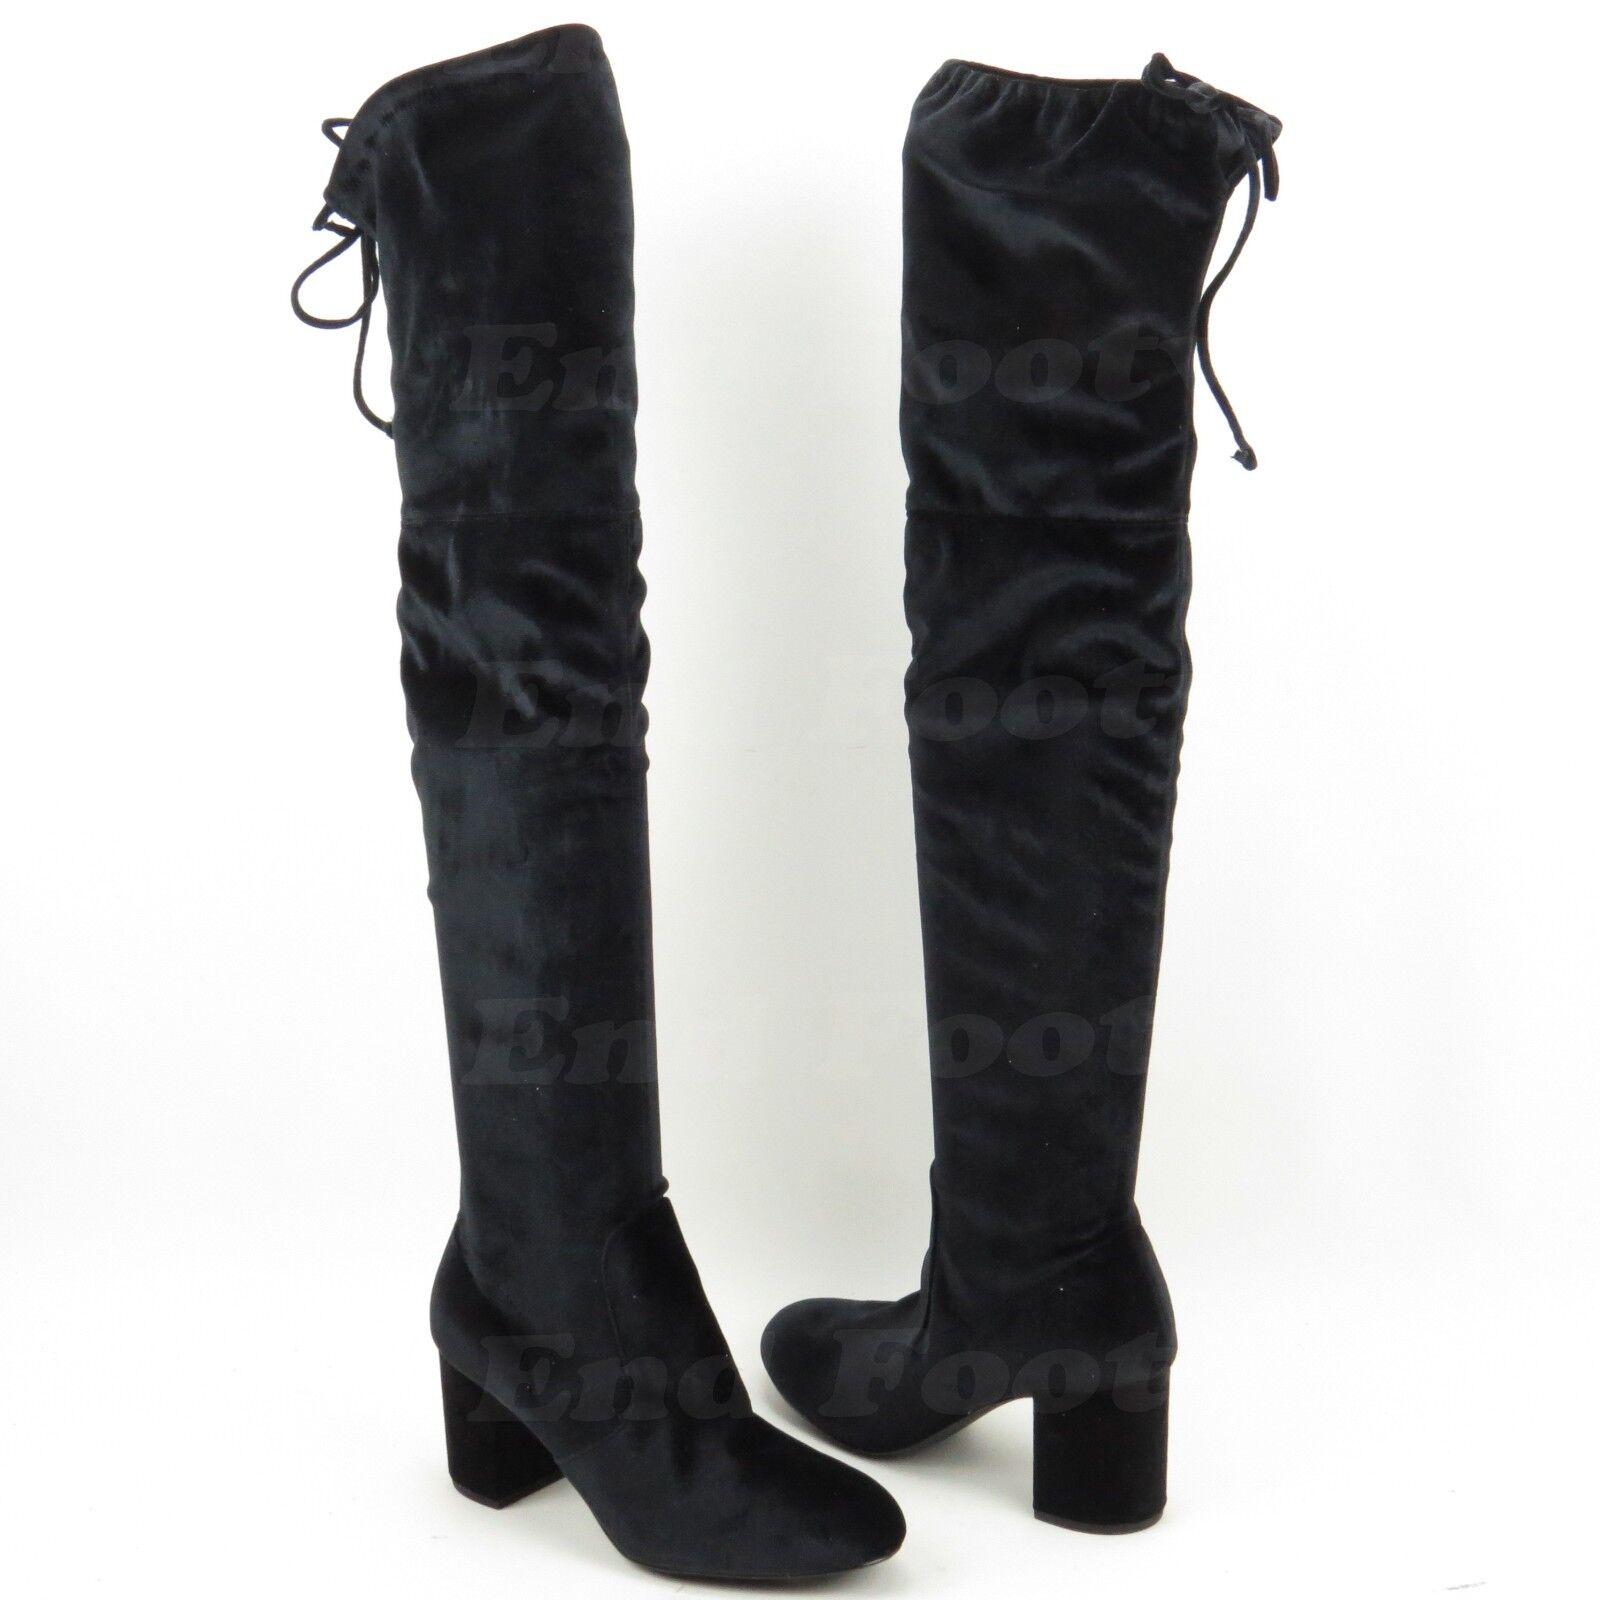 NEW Charles David Owen Black Velvet Over-the-Knee Boots Boots Boots Women's Size 9.5 M 1e74d5